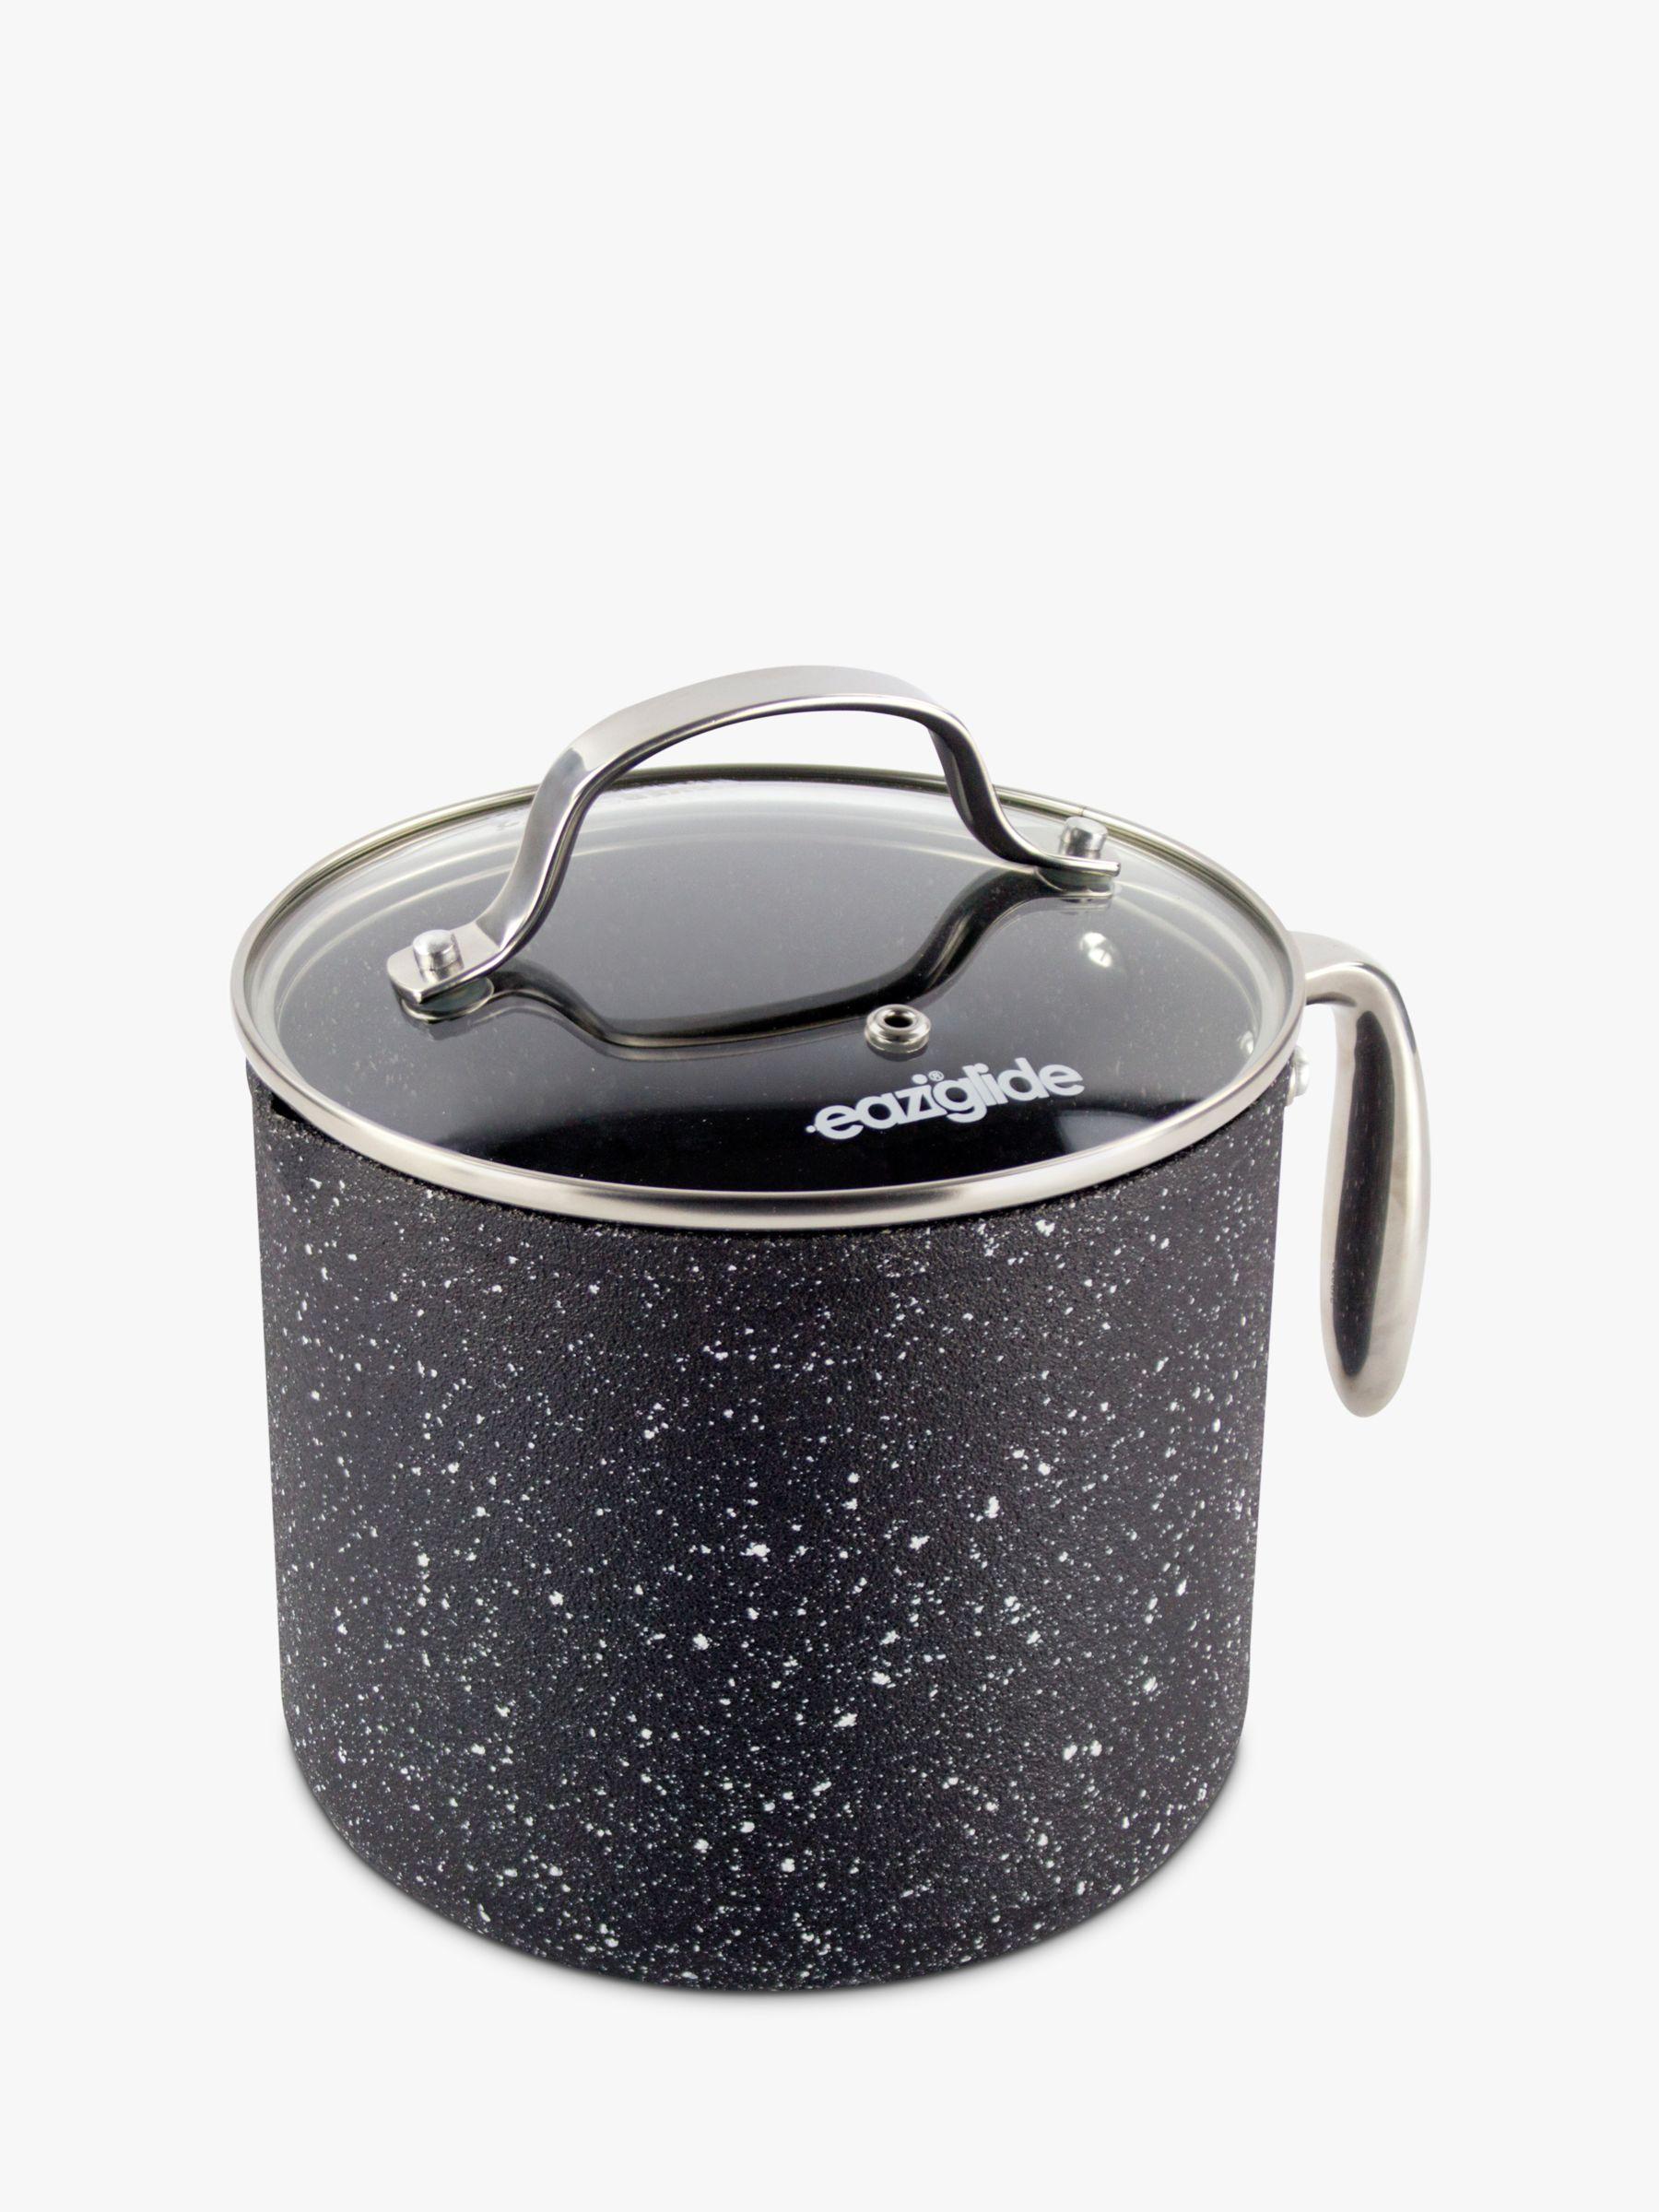 Eaziglide Eaziglide Neverstick2 Non-Stick Sauce Pot and Lid, 16cm, Black